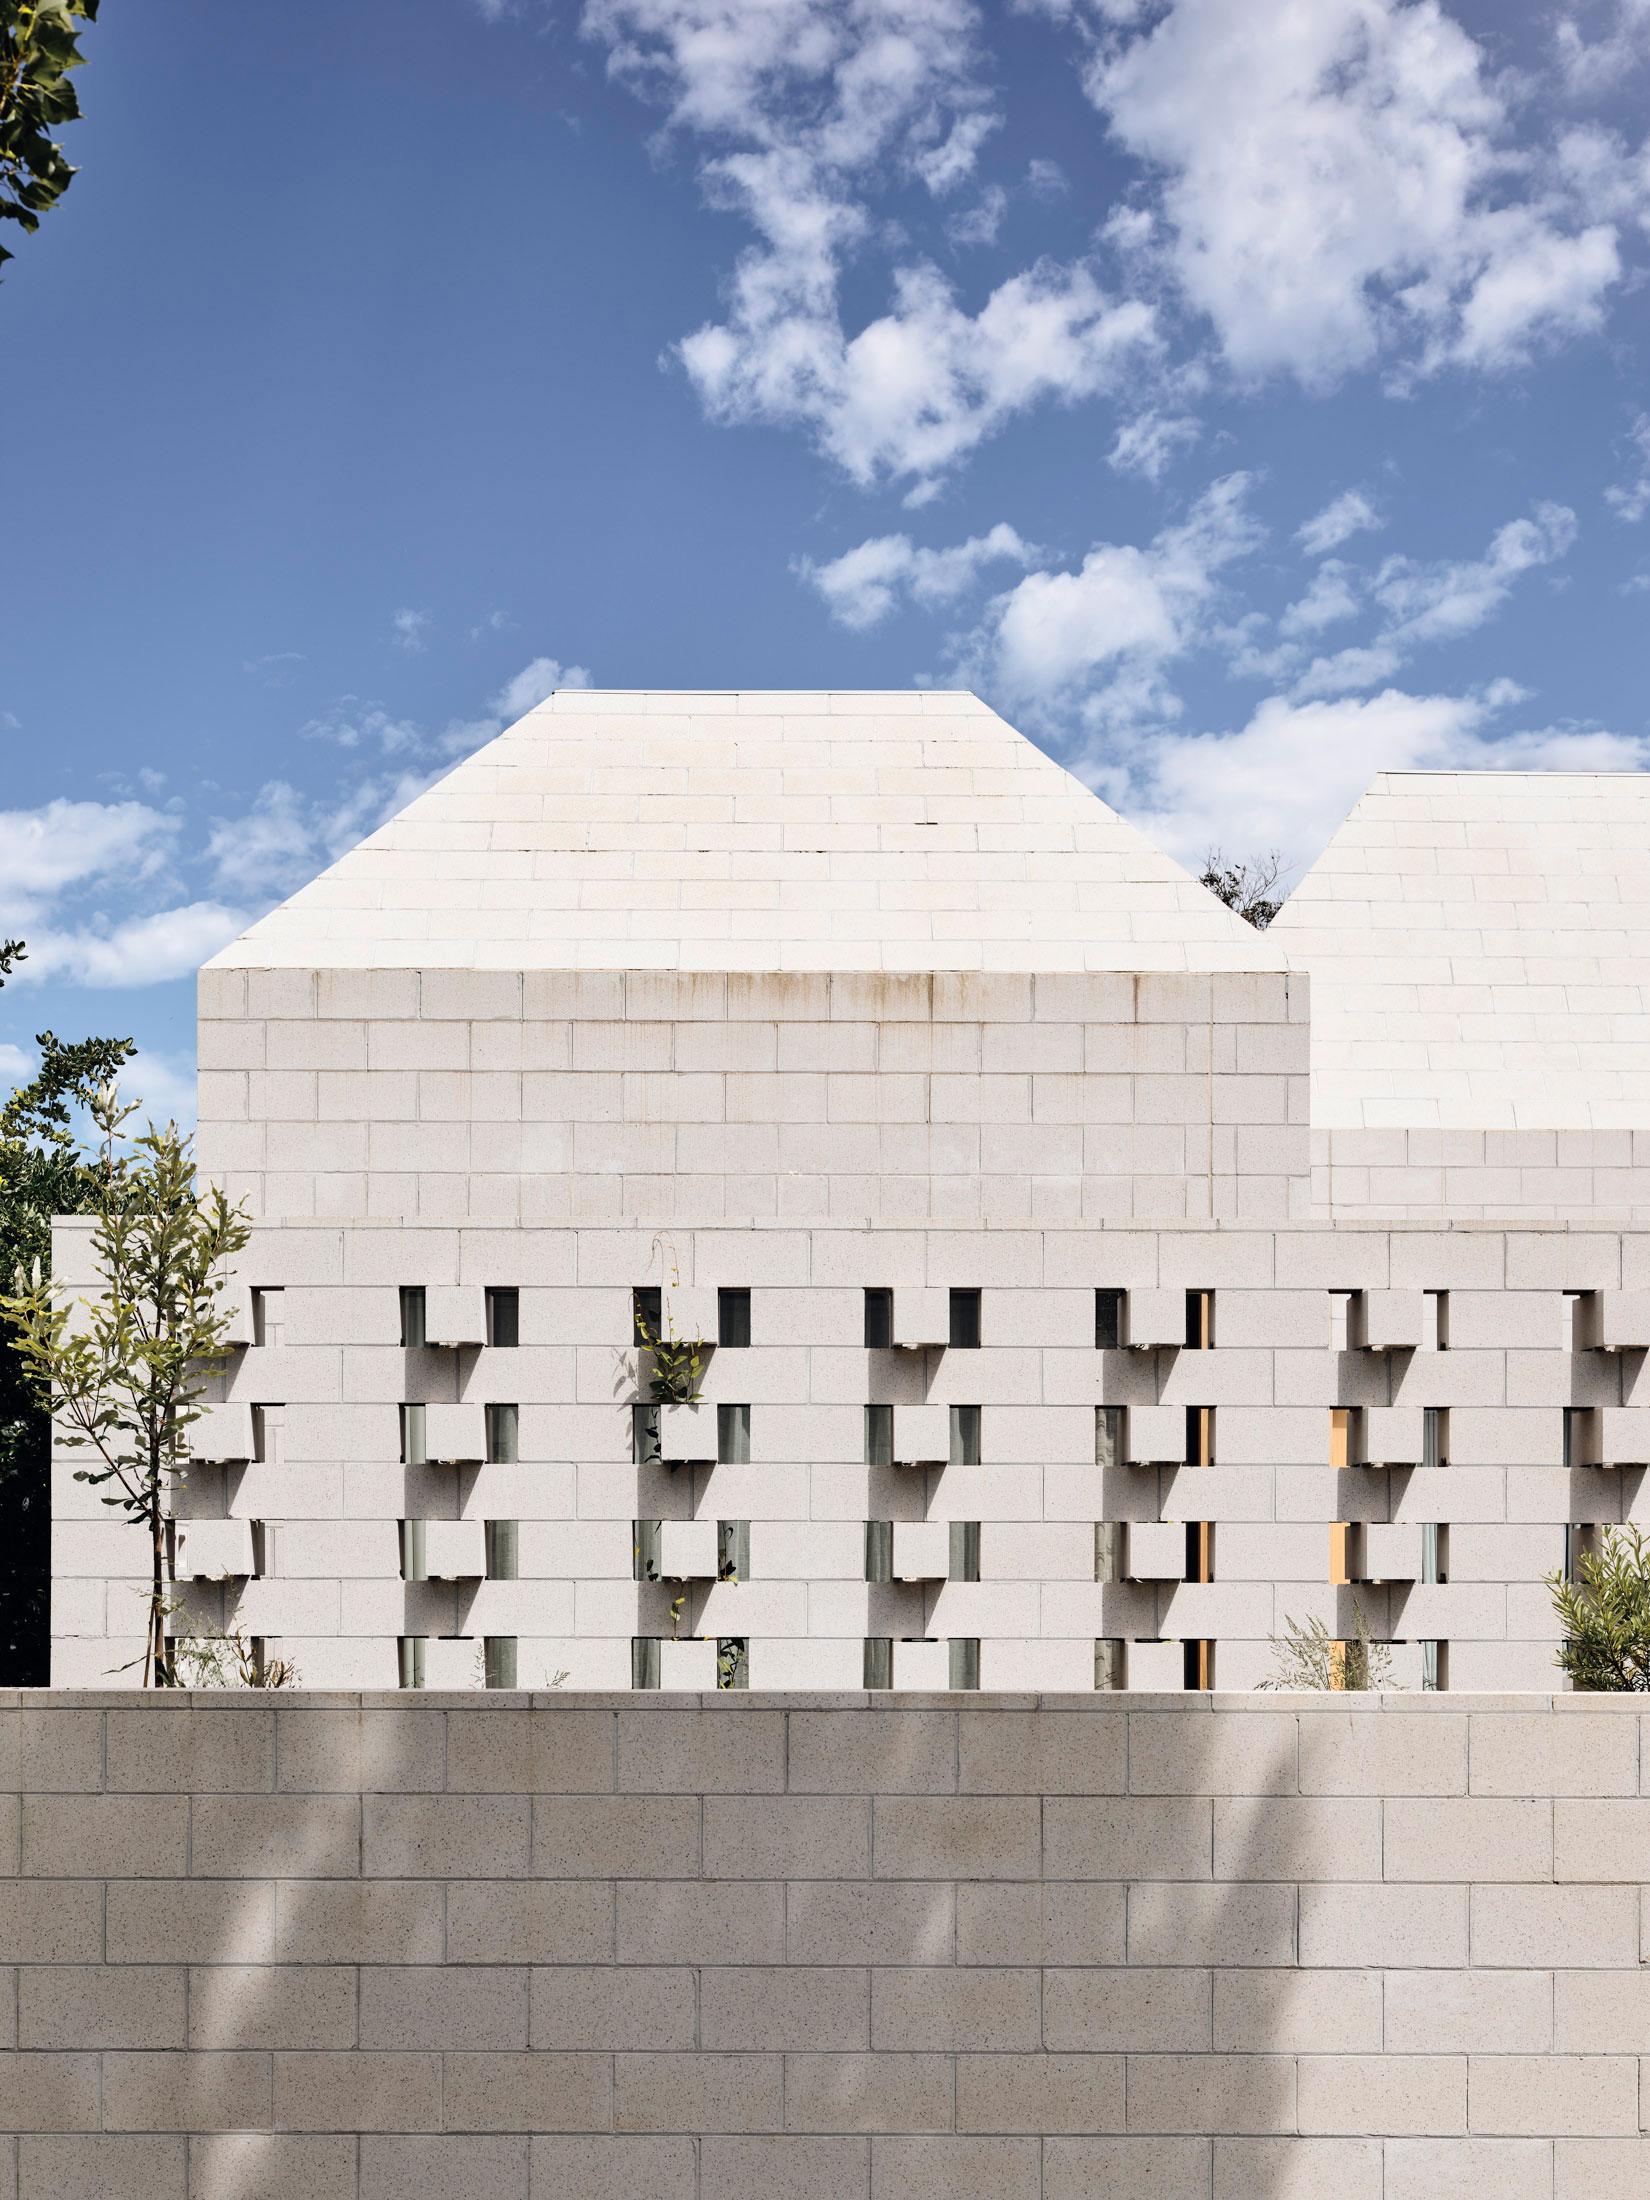 Architects Eat Bellows Beach House Flinders Masonry Architecture Photo Derek Swalwell Yellowtrace 03